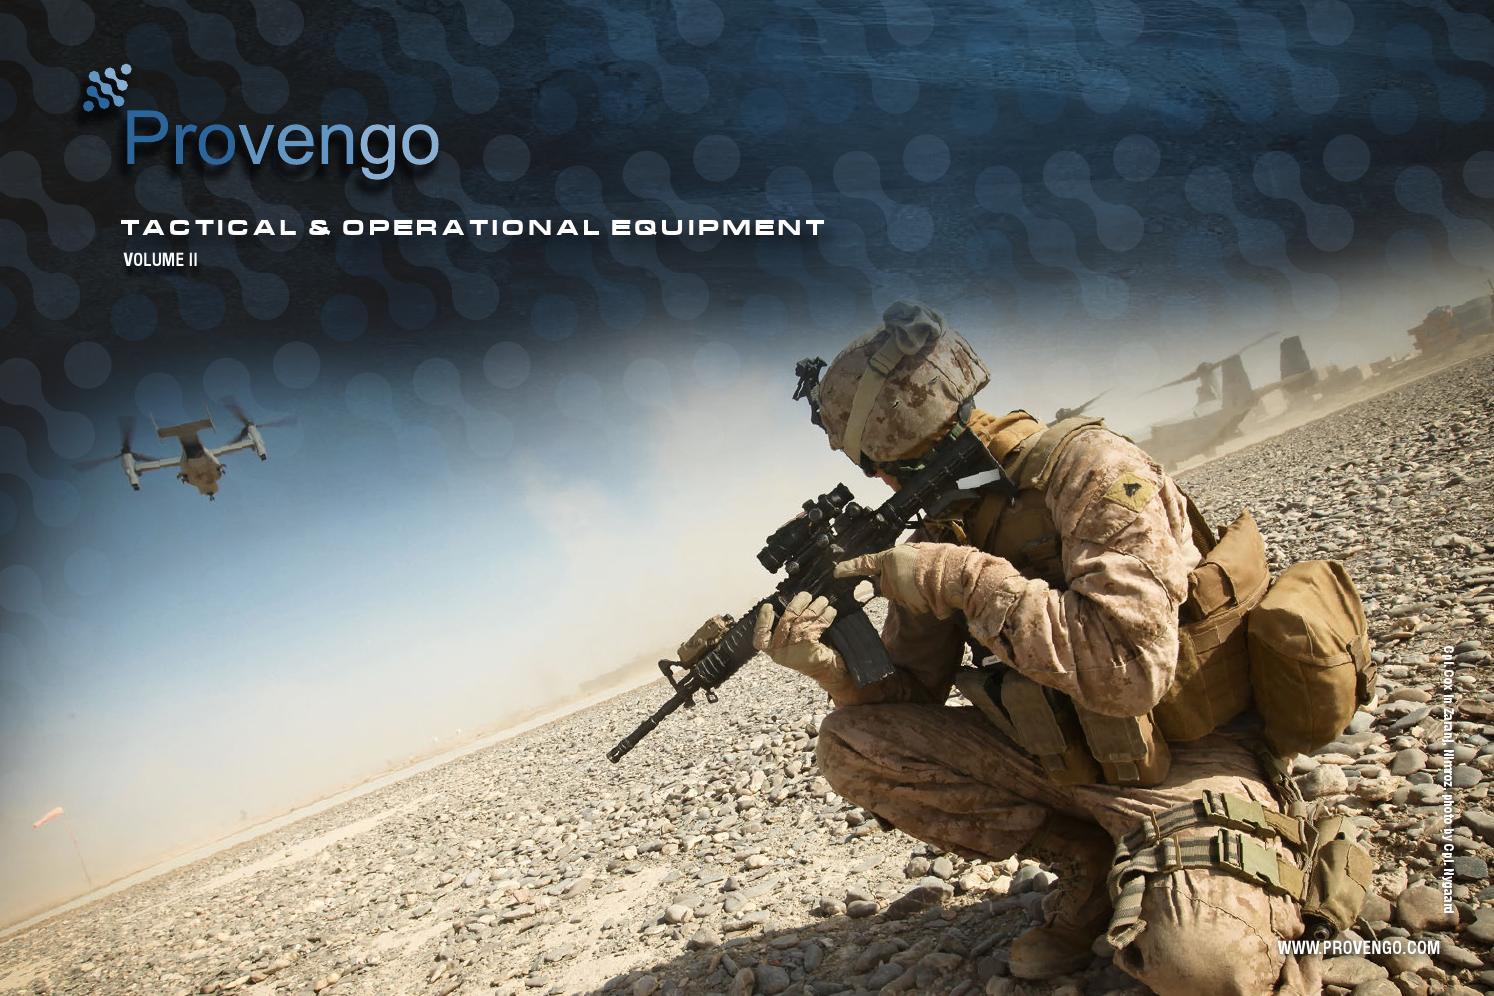 4f1928f2e11 Provengo Tactical   Operational Equipment Catalog by Provengo - issuu